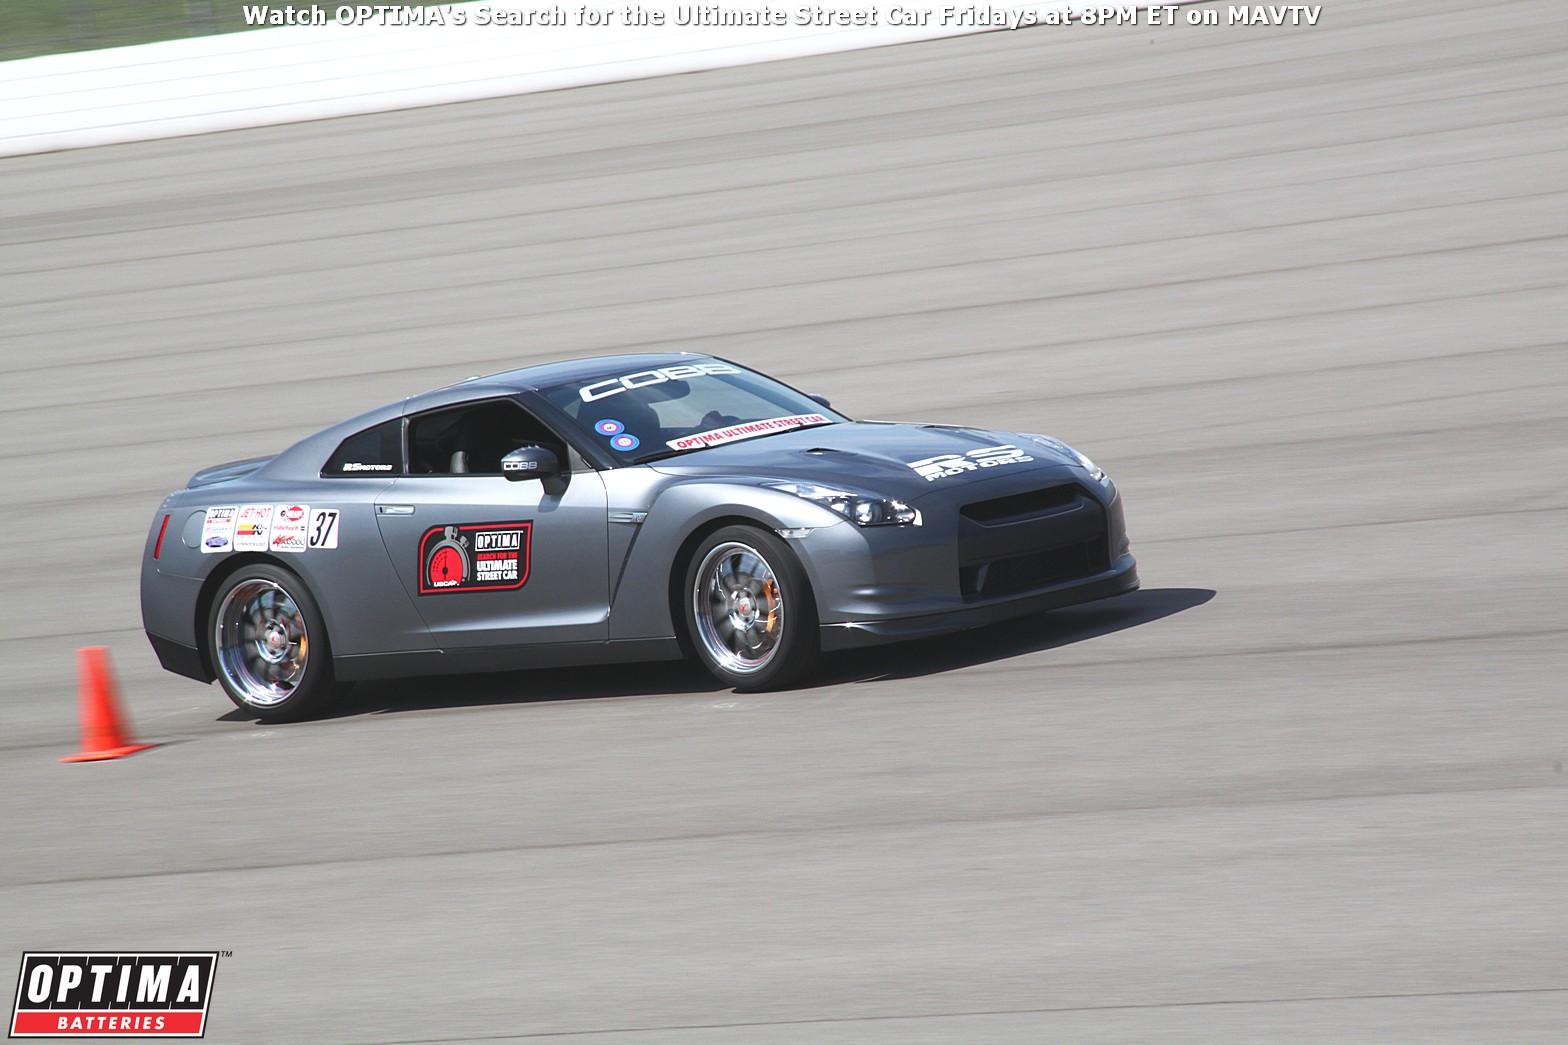 Nissan nissan gtr 2014 : 2014 OUSCI Preview- AJ Santiago's 2011 Nissan GT-R